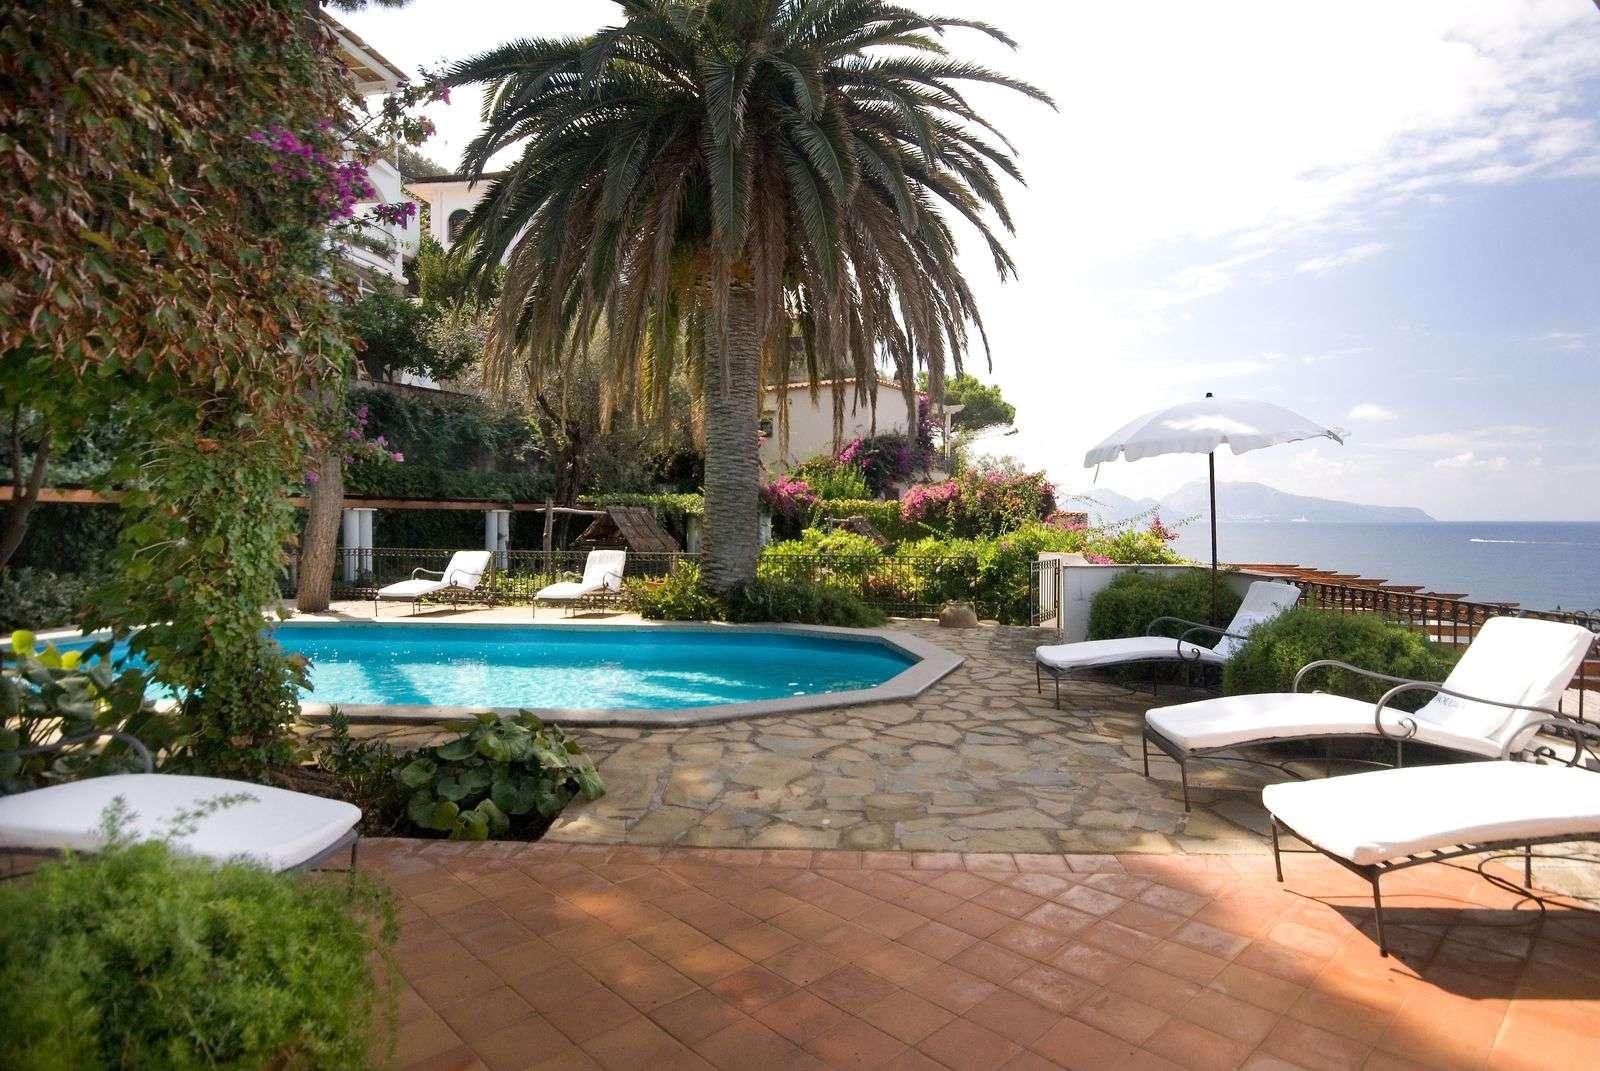 Luxury vacation rentals europe - Italy - Amalfi coast - Sorren to - Tropic - Image 1/16